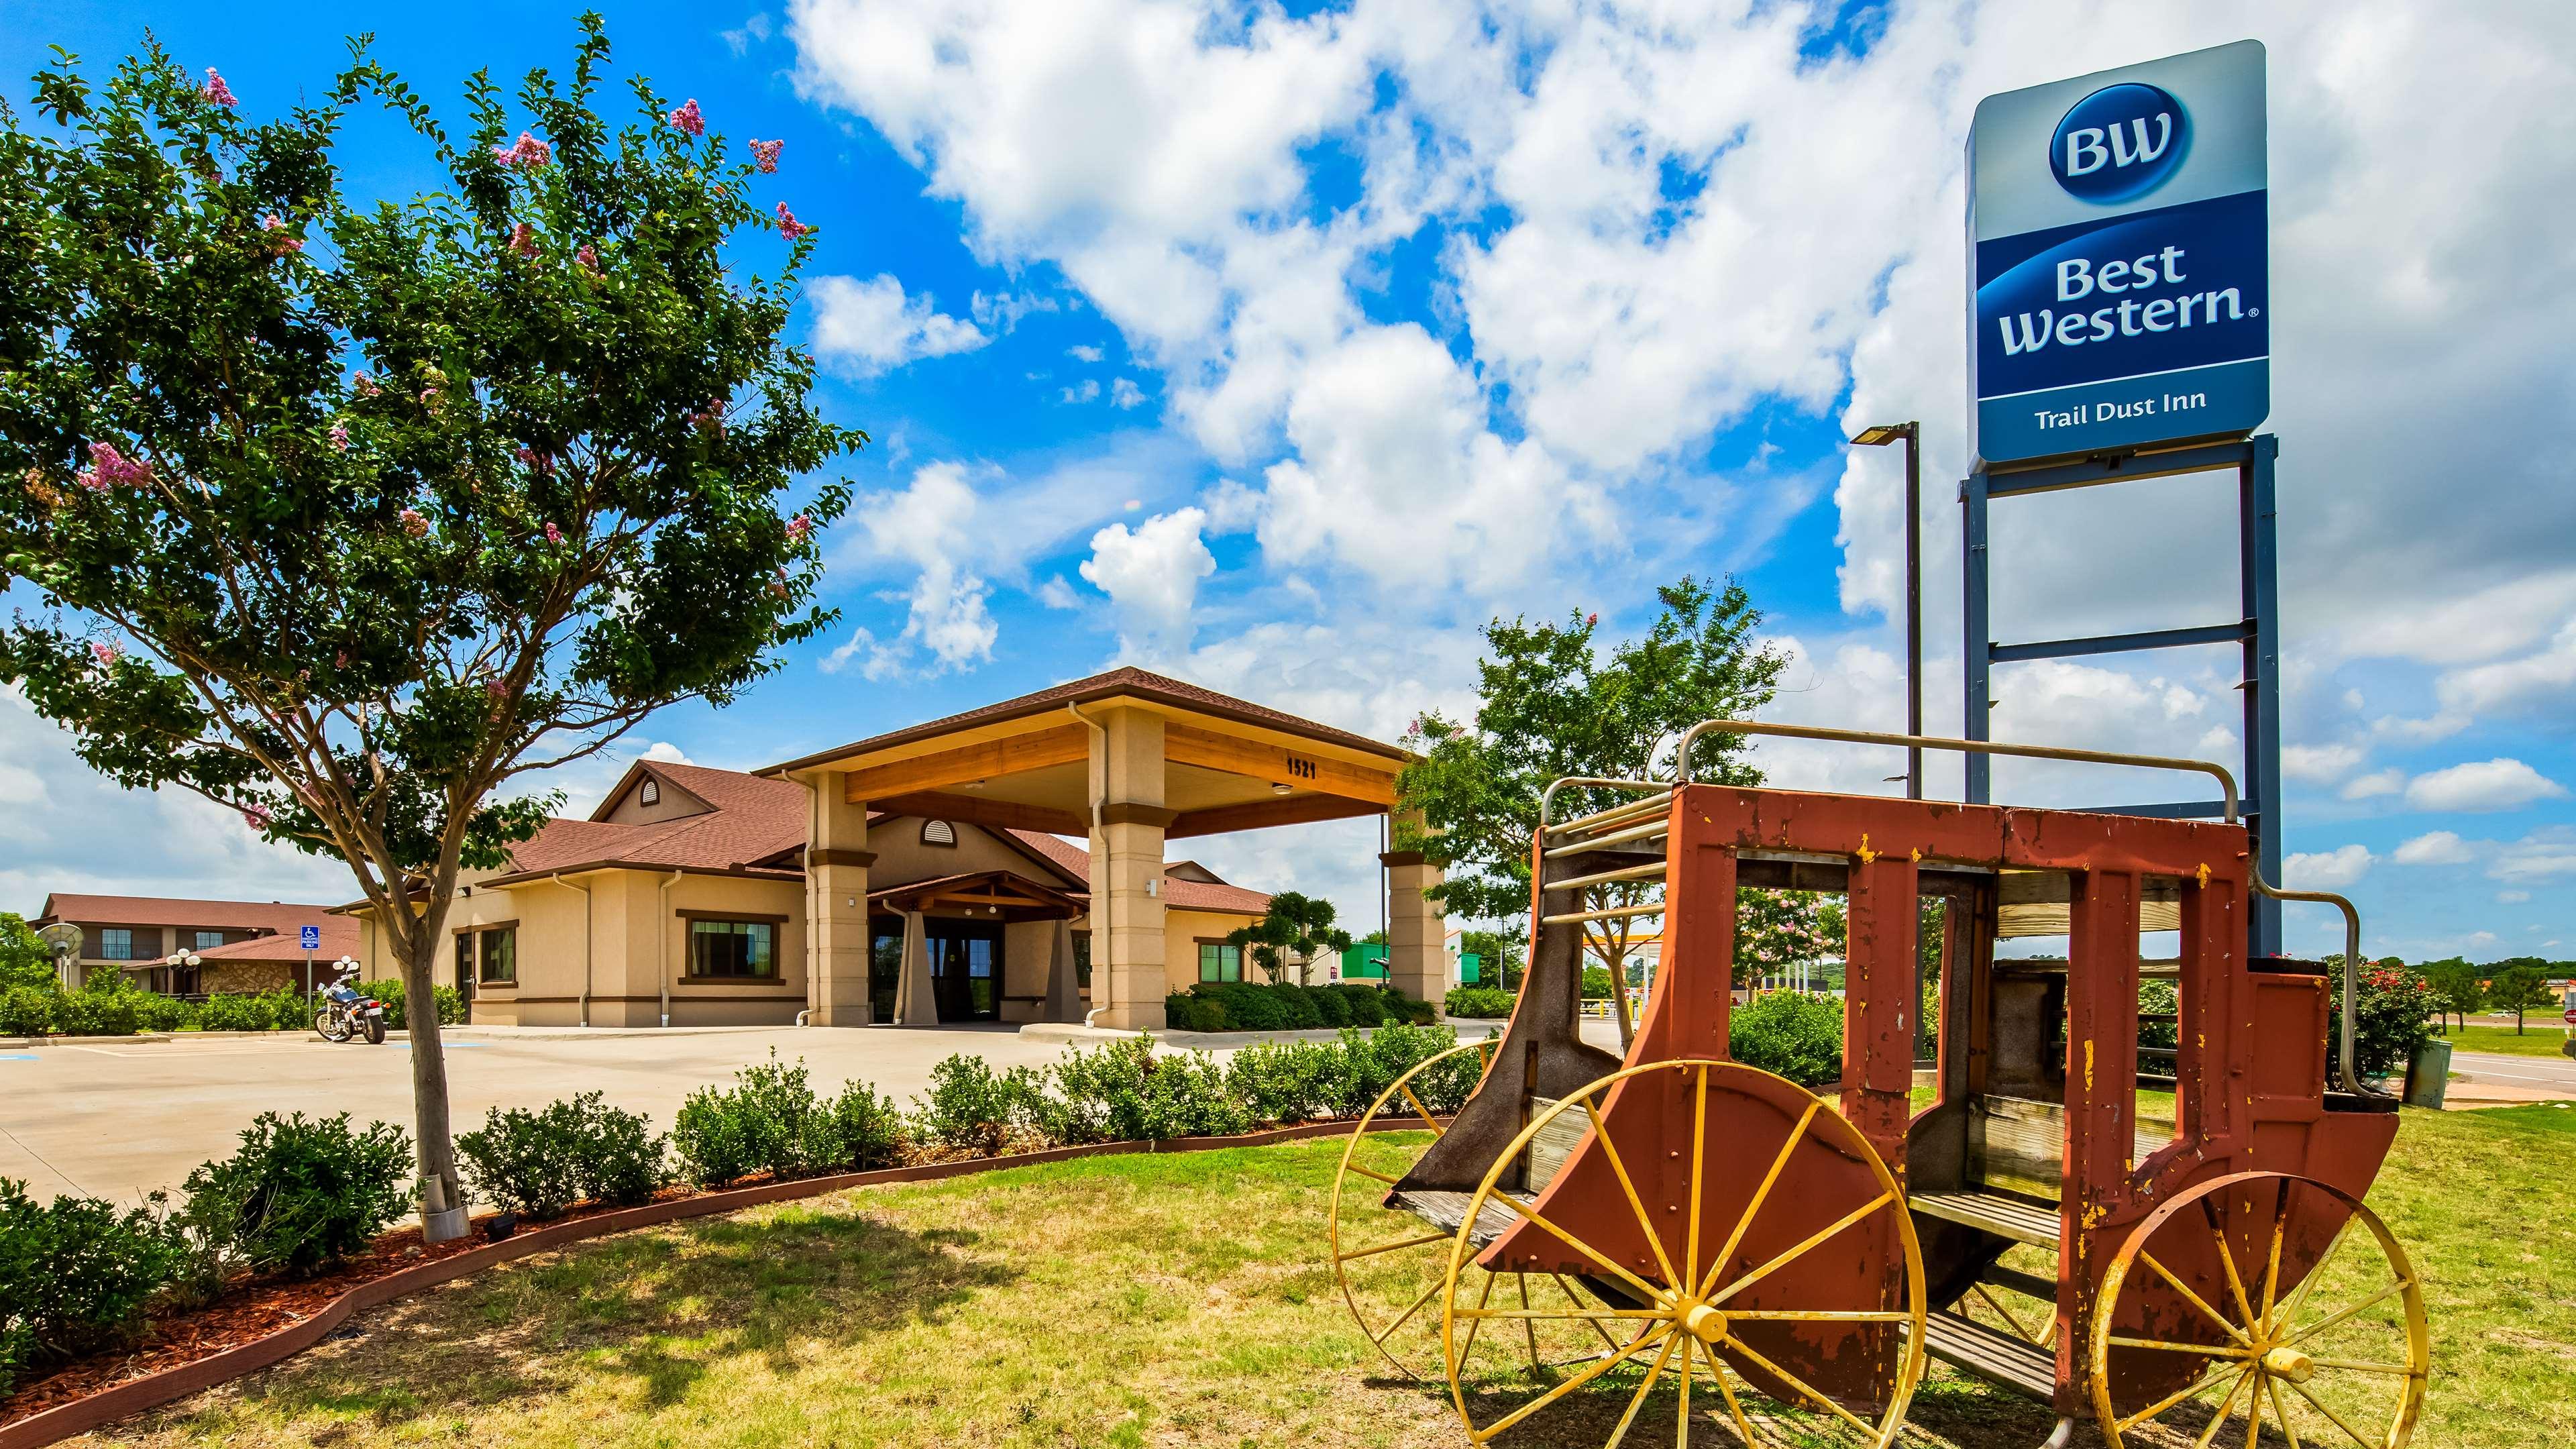 Best Western Trail Dust Inn & Suites image 0